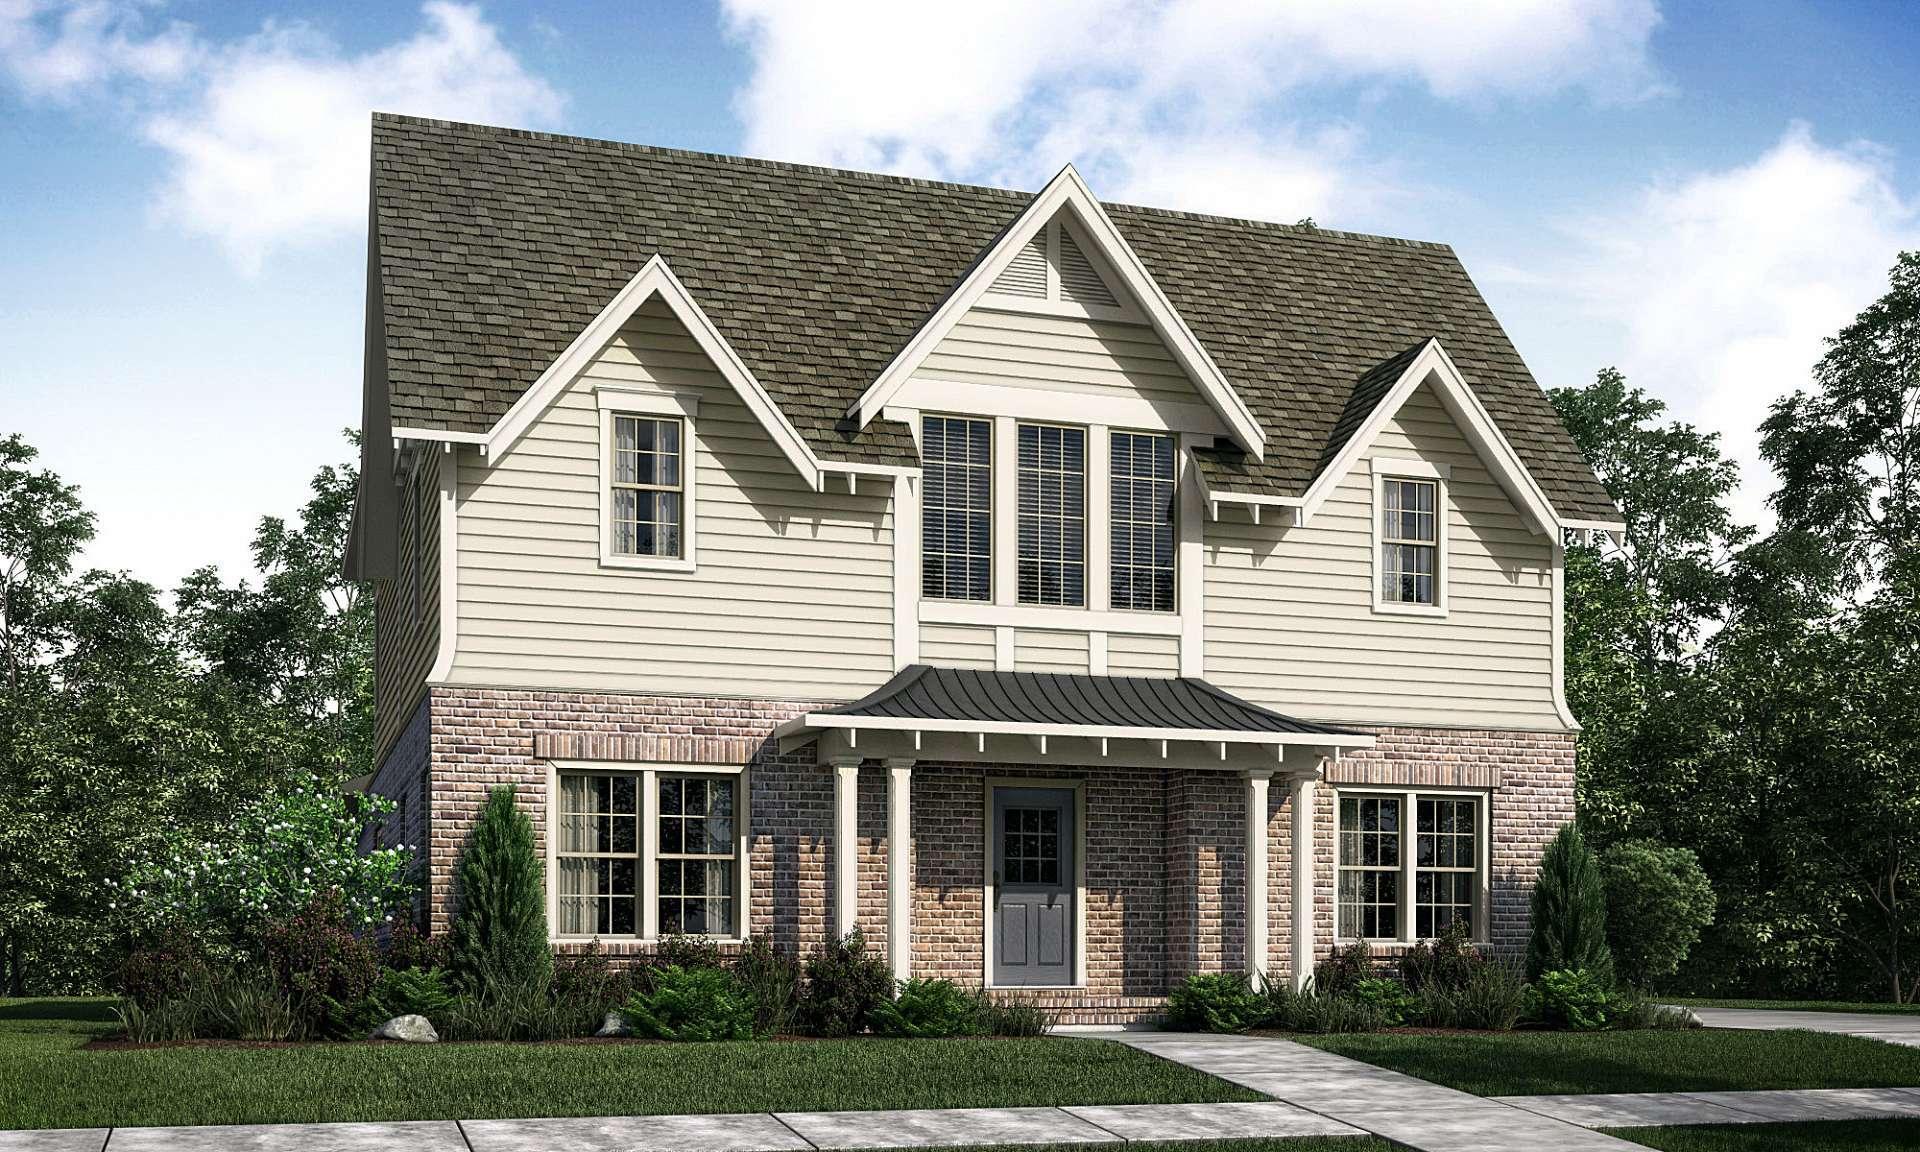 Single Family for Sale at Altadena Ridge - Nelson A Birmingham, Alabama 35243 United States